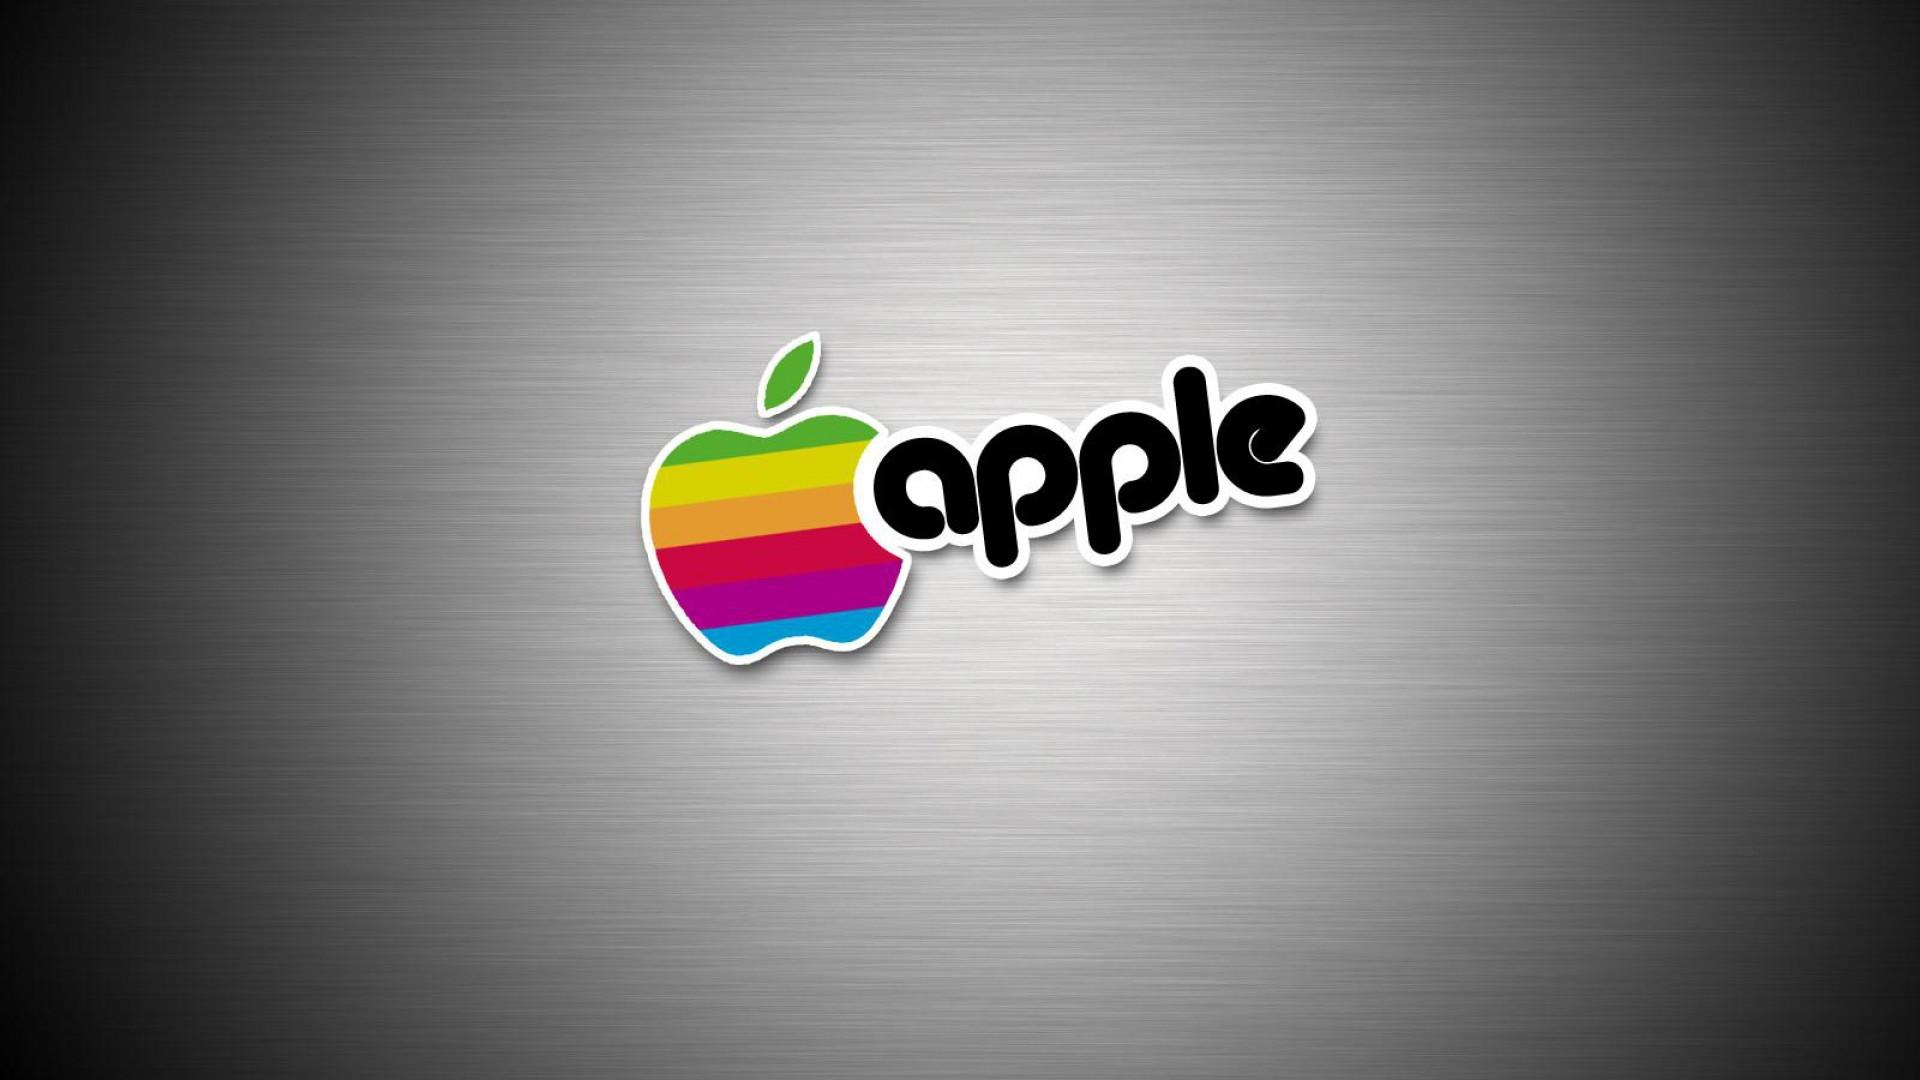 Beautiful Wallpaper Name Yash - 1163986-names-logos-wallpapers-1920x1080-mac  Pictures_23488.jpg